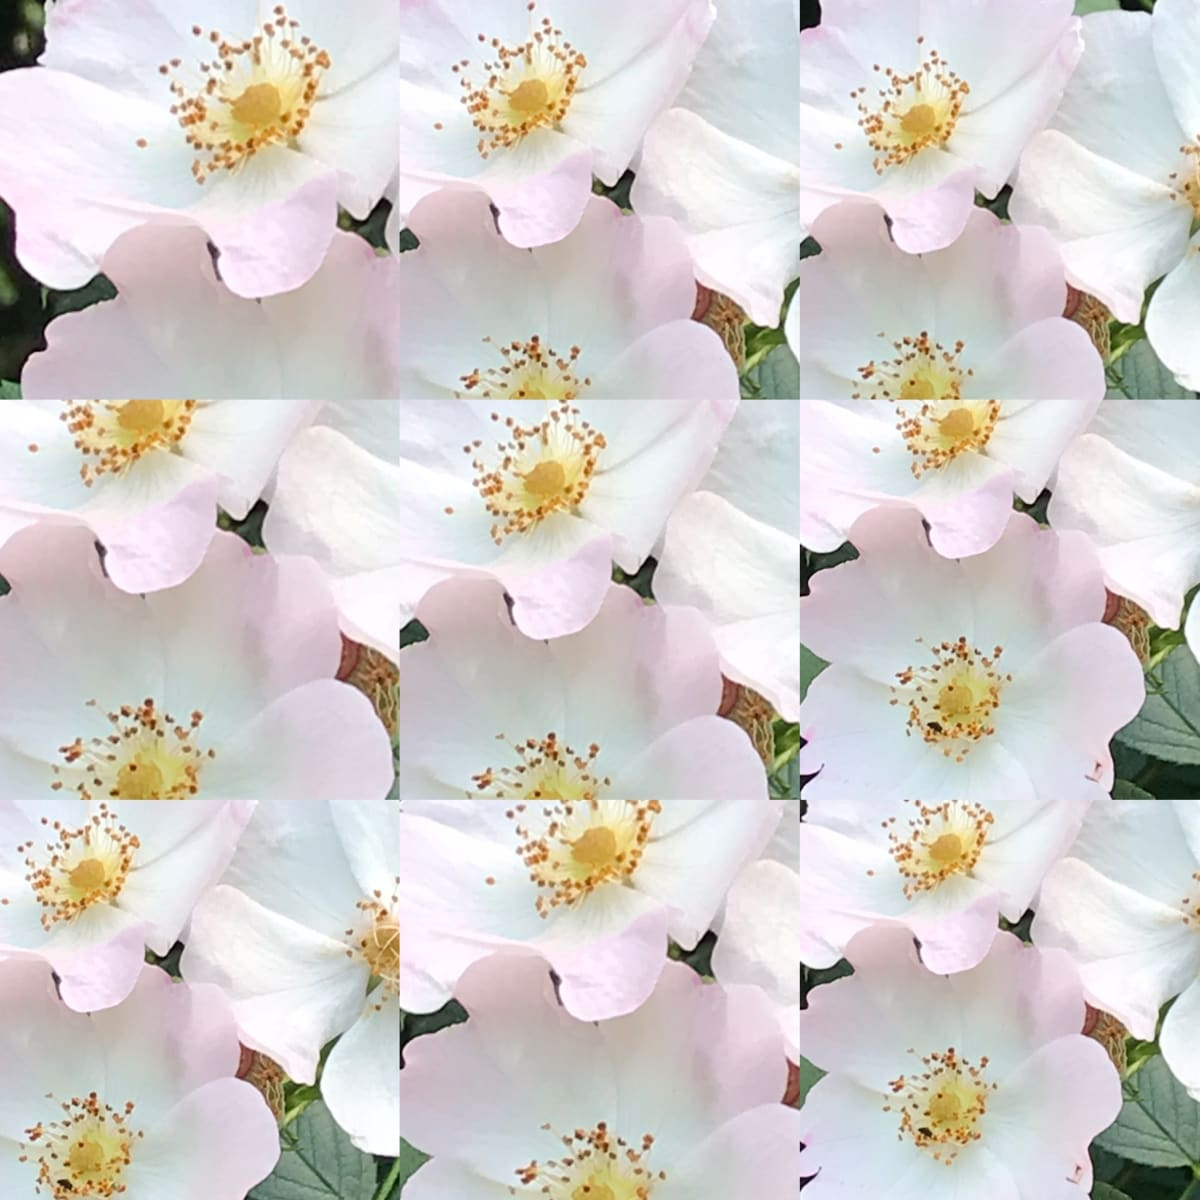 754-Hill House Rosehip Bloom by Katy Cauker